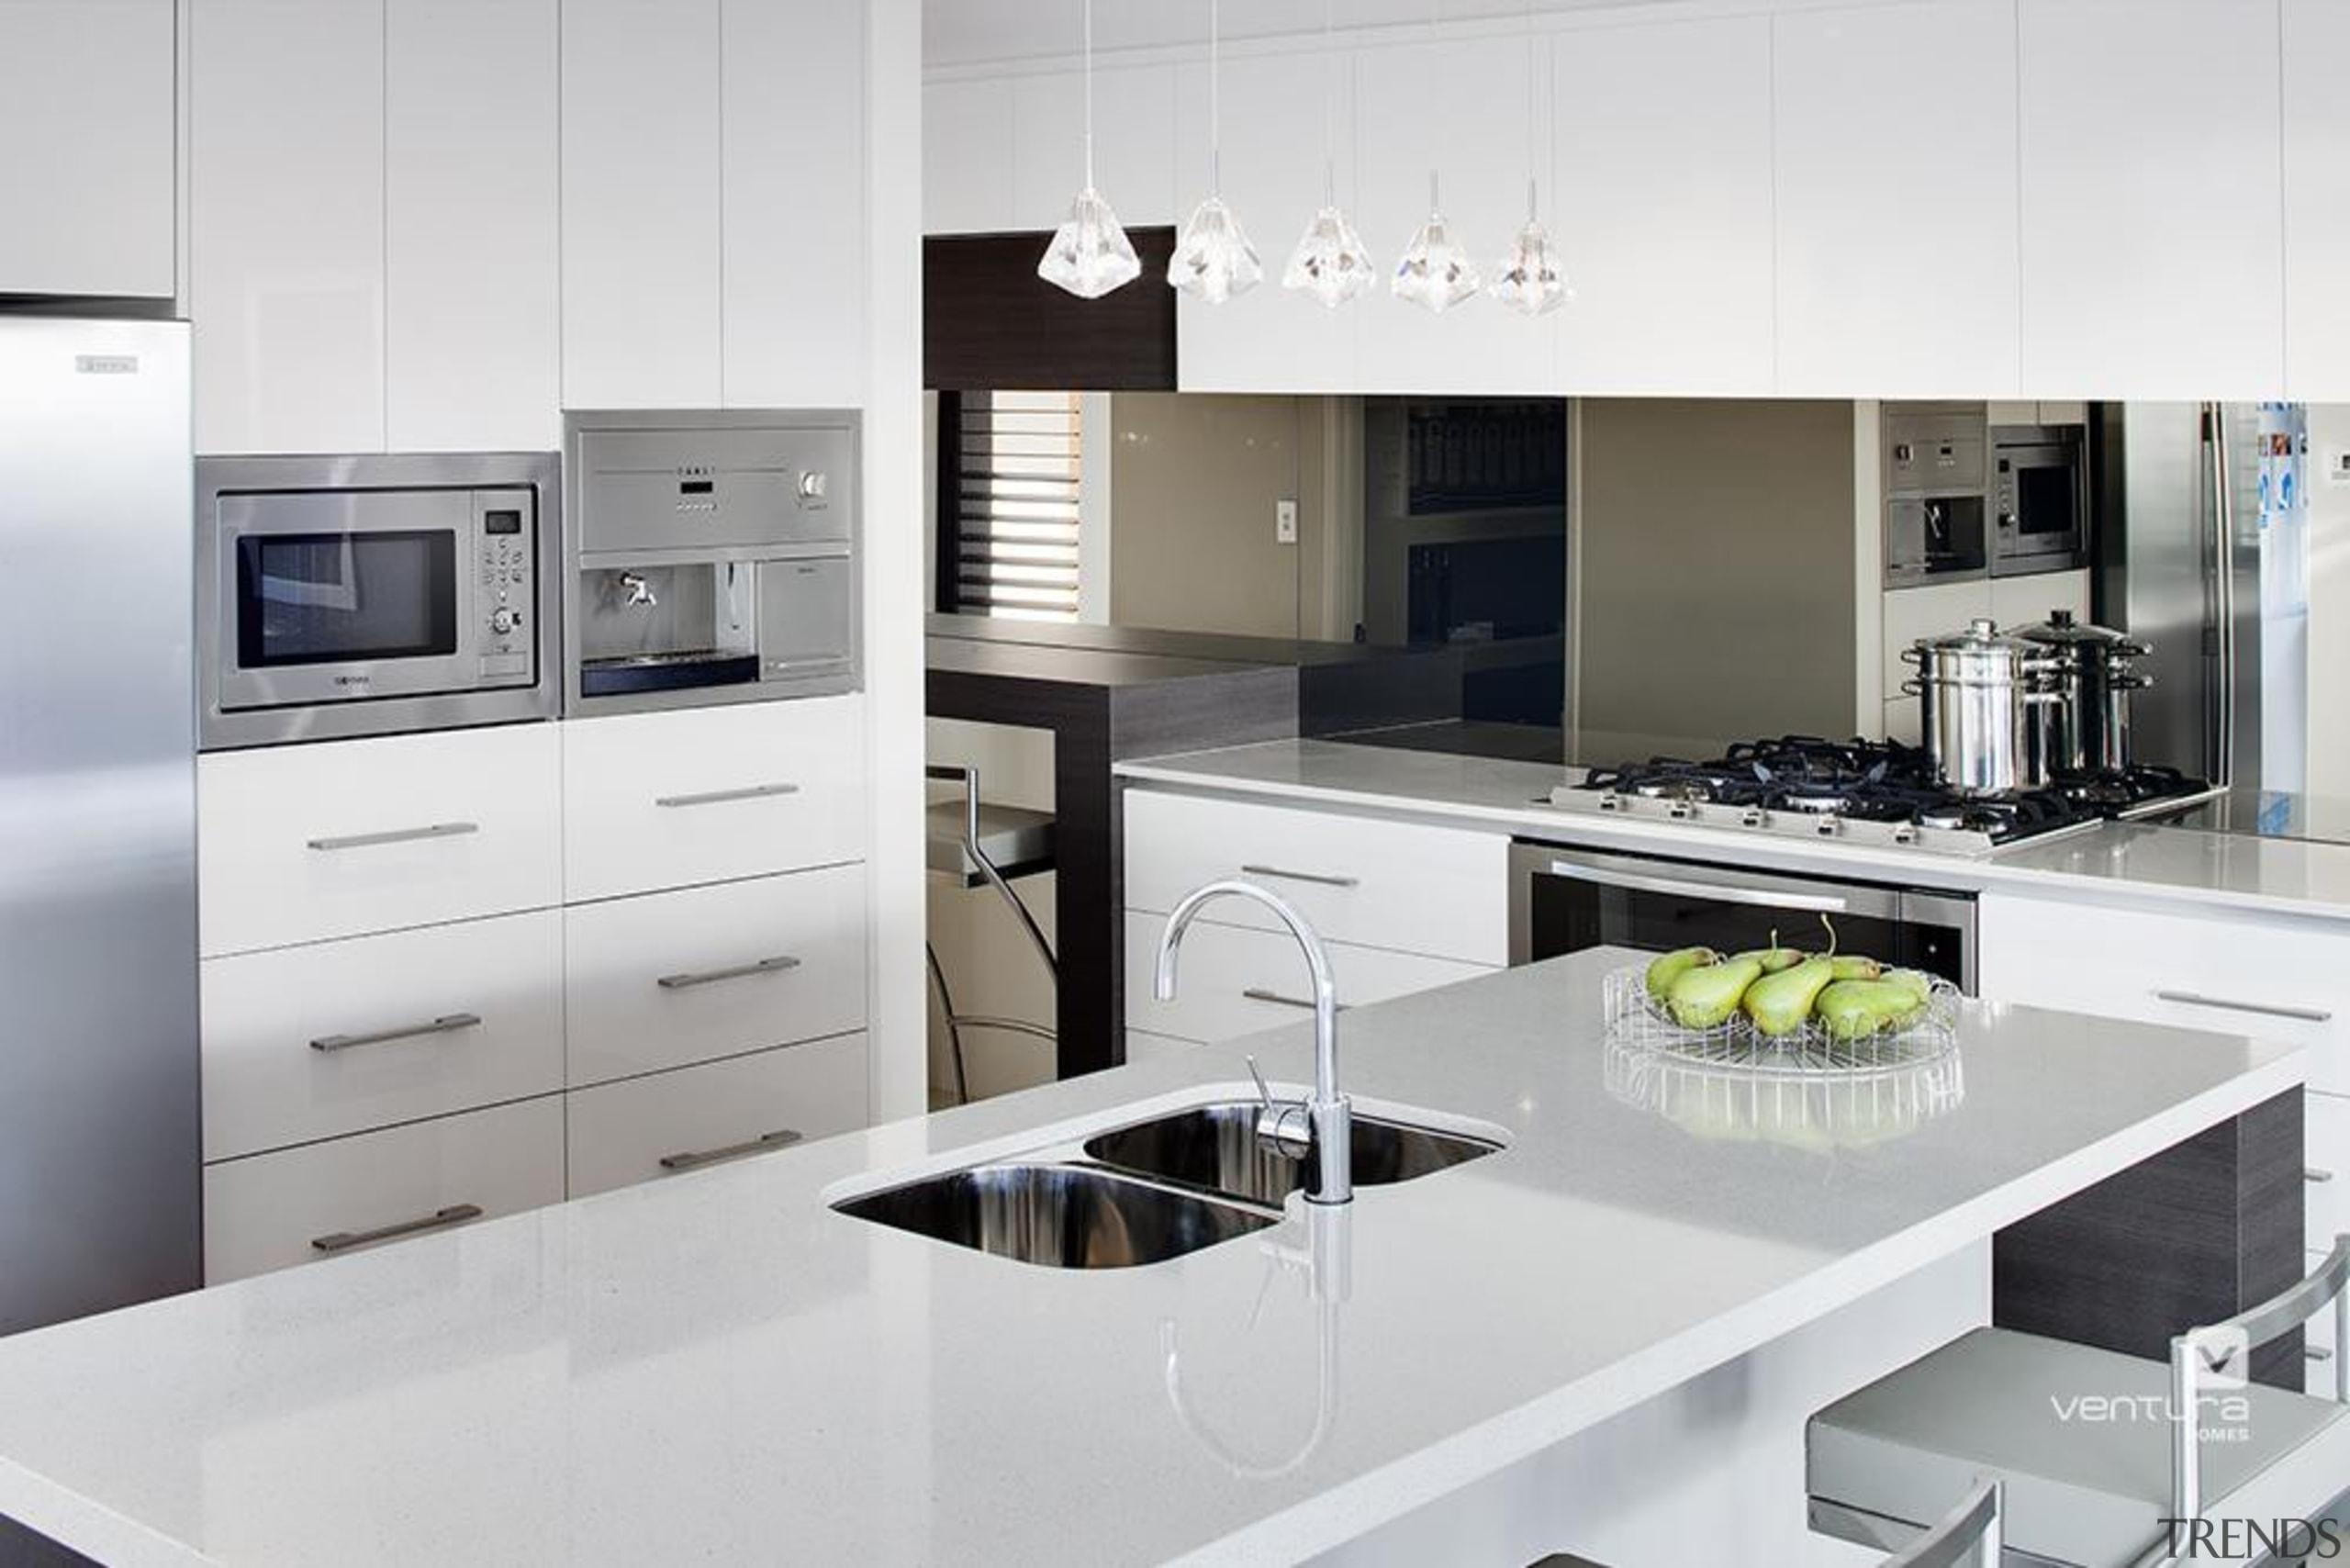 Kitchen design. - The New Dimension Display Home countertop, cuisine classique, home appliance, interior design, kitchen, kitchen appliance, kitchen stove, major appliance, product, product design, small appliance, white